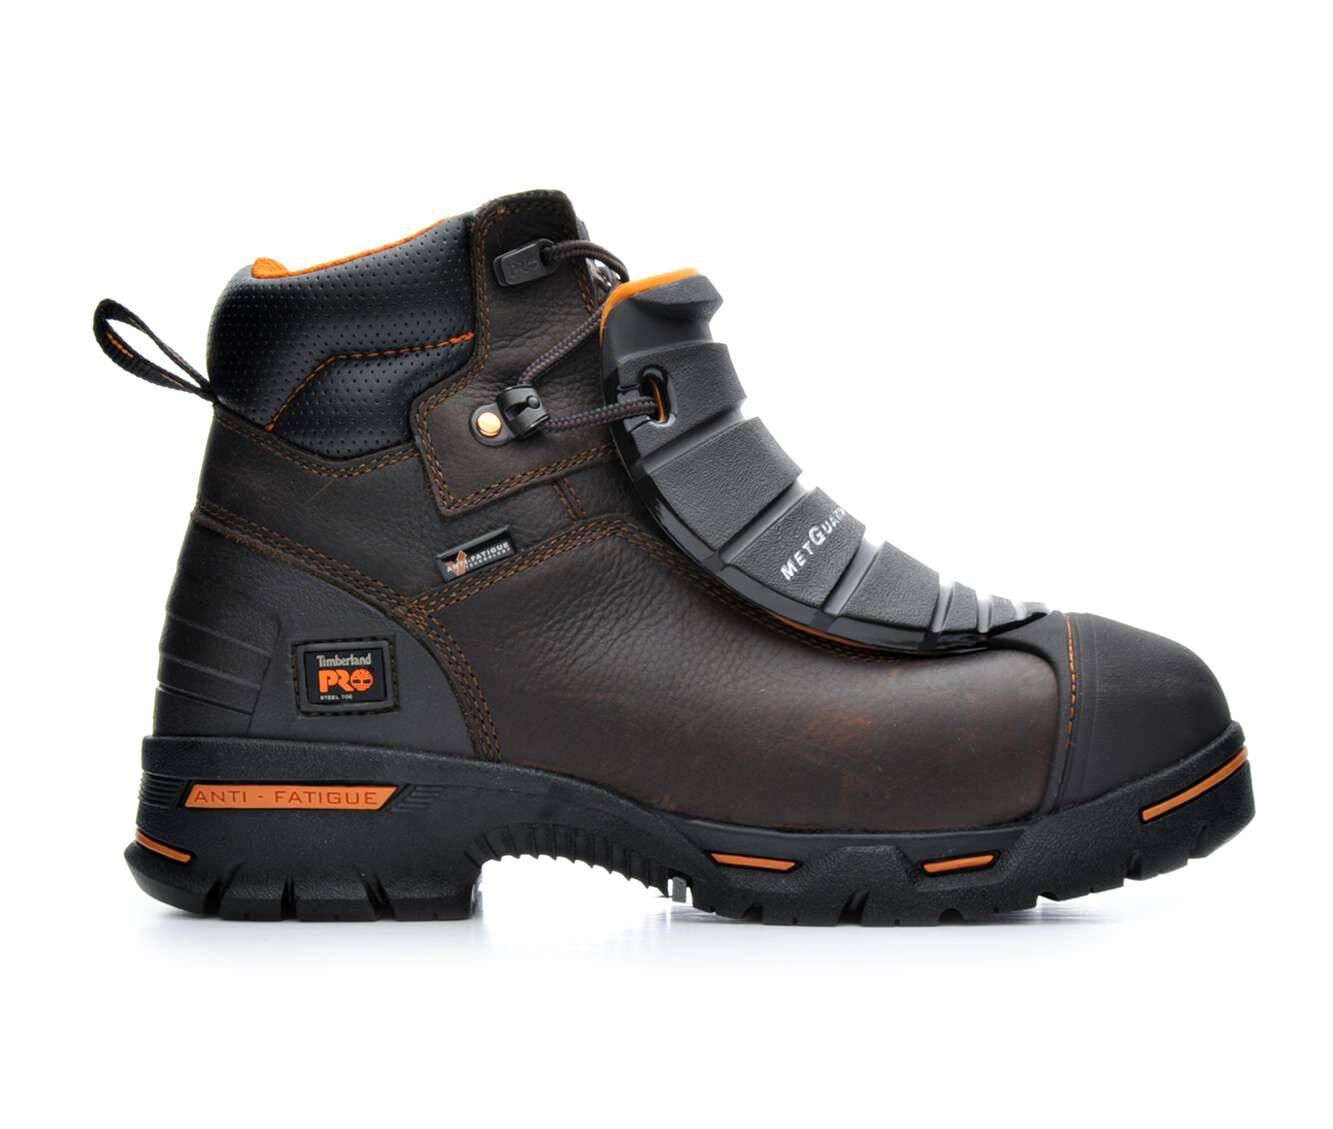 Men's Timberland Pro A172T Endurance Steel Toe Met Guard Work Boots Brown